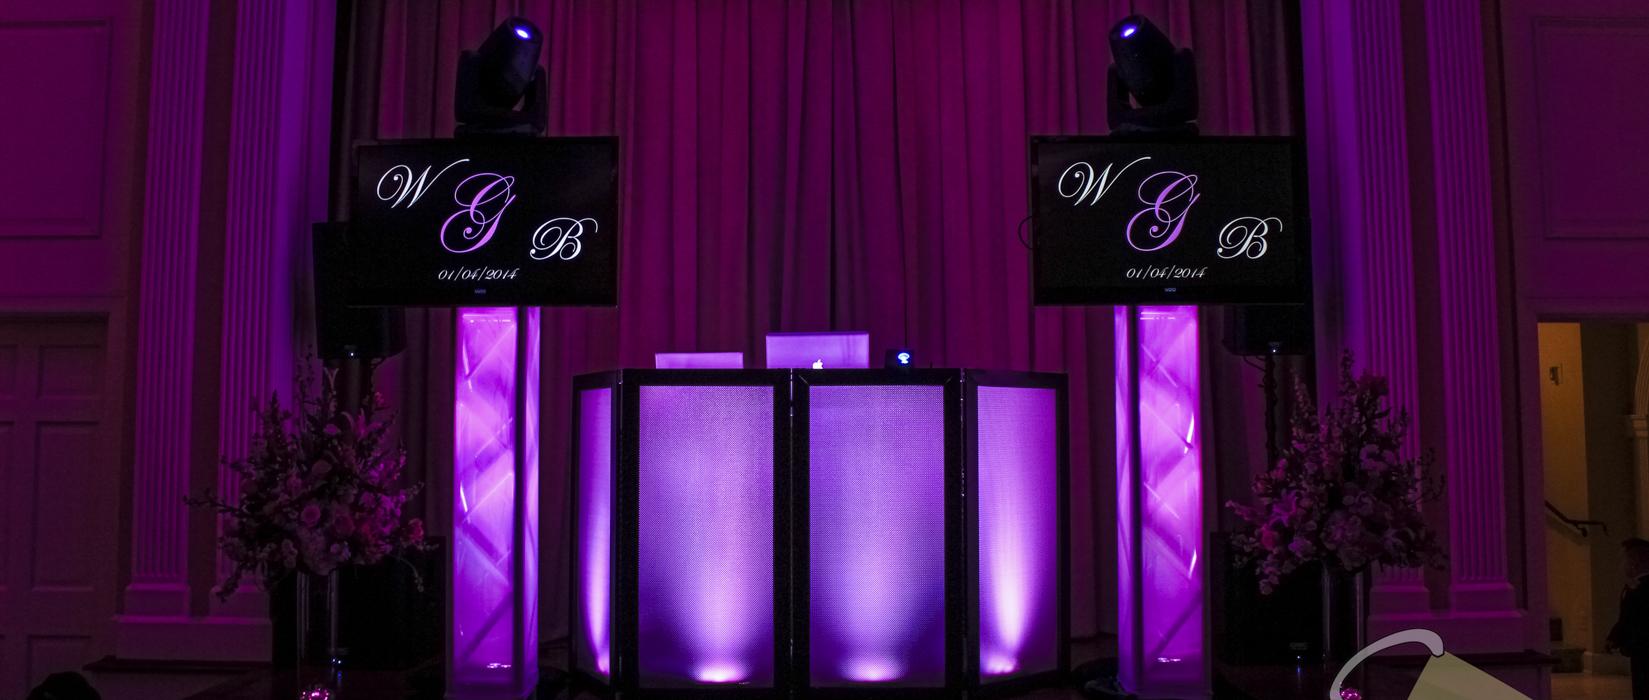 Intelligent lighting dallas wedding dj steward 39 s for Dallas wedding dj